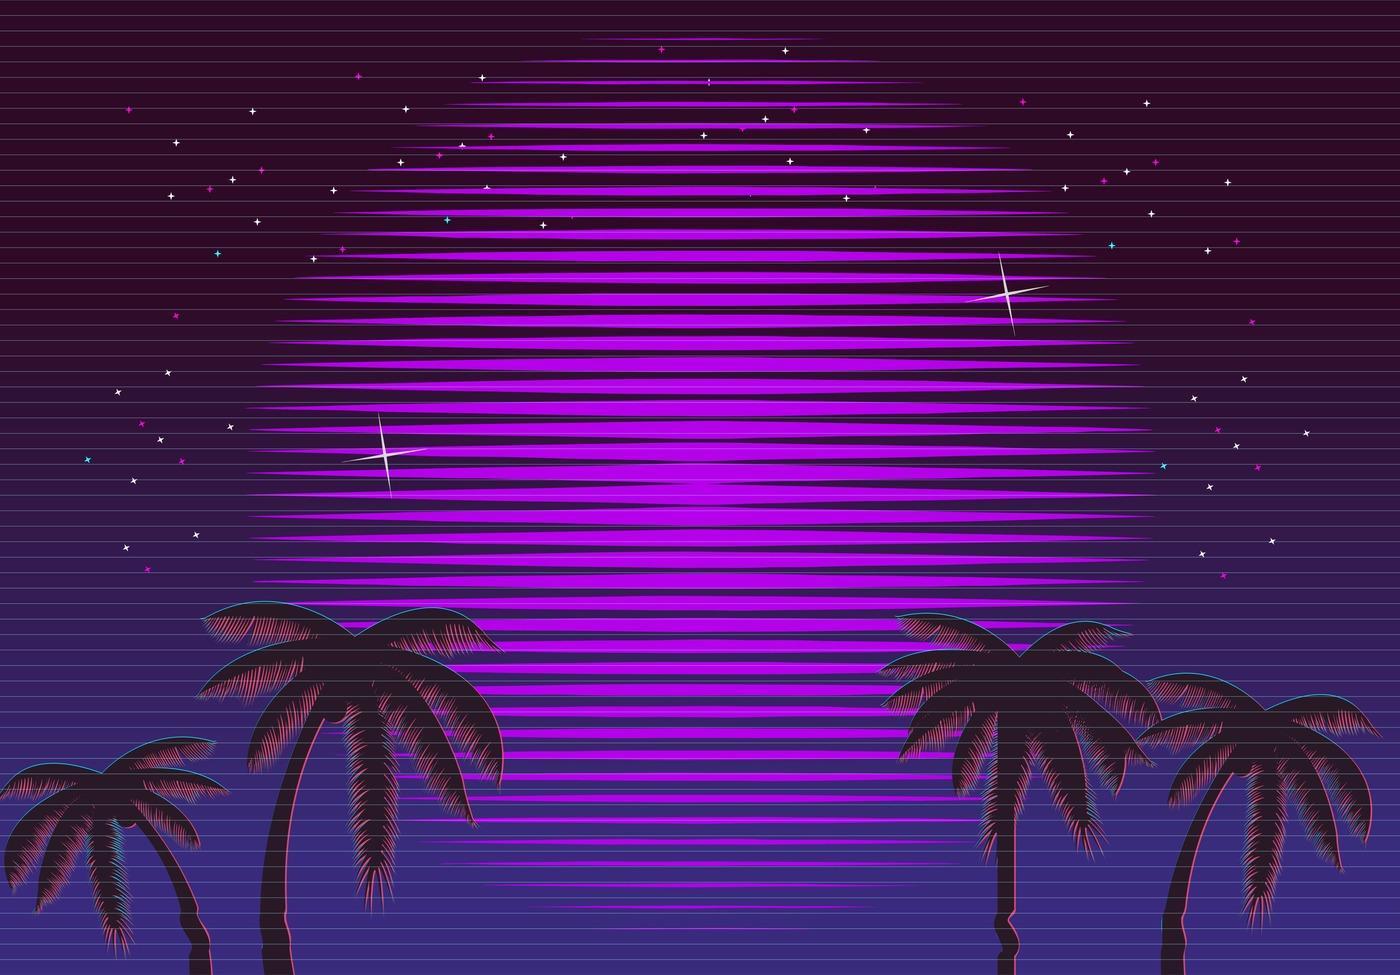 80s retro neon gradient 1024x768 resolution backgrounds - 1024x768